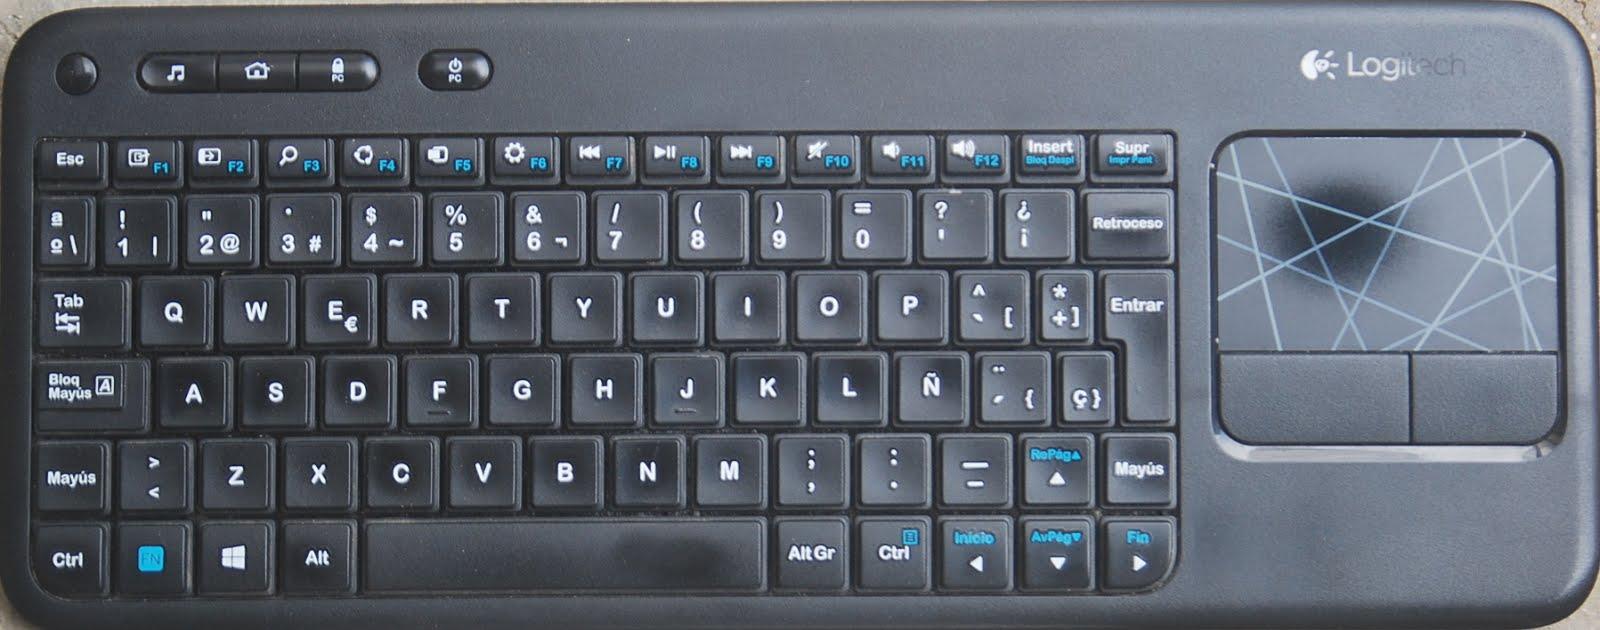 LOGITECH K400 KEYBOARD SETPOINT TREIBER WINDOWS XP